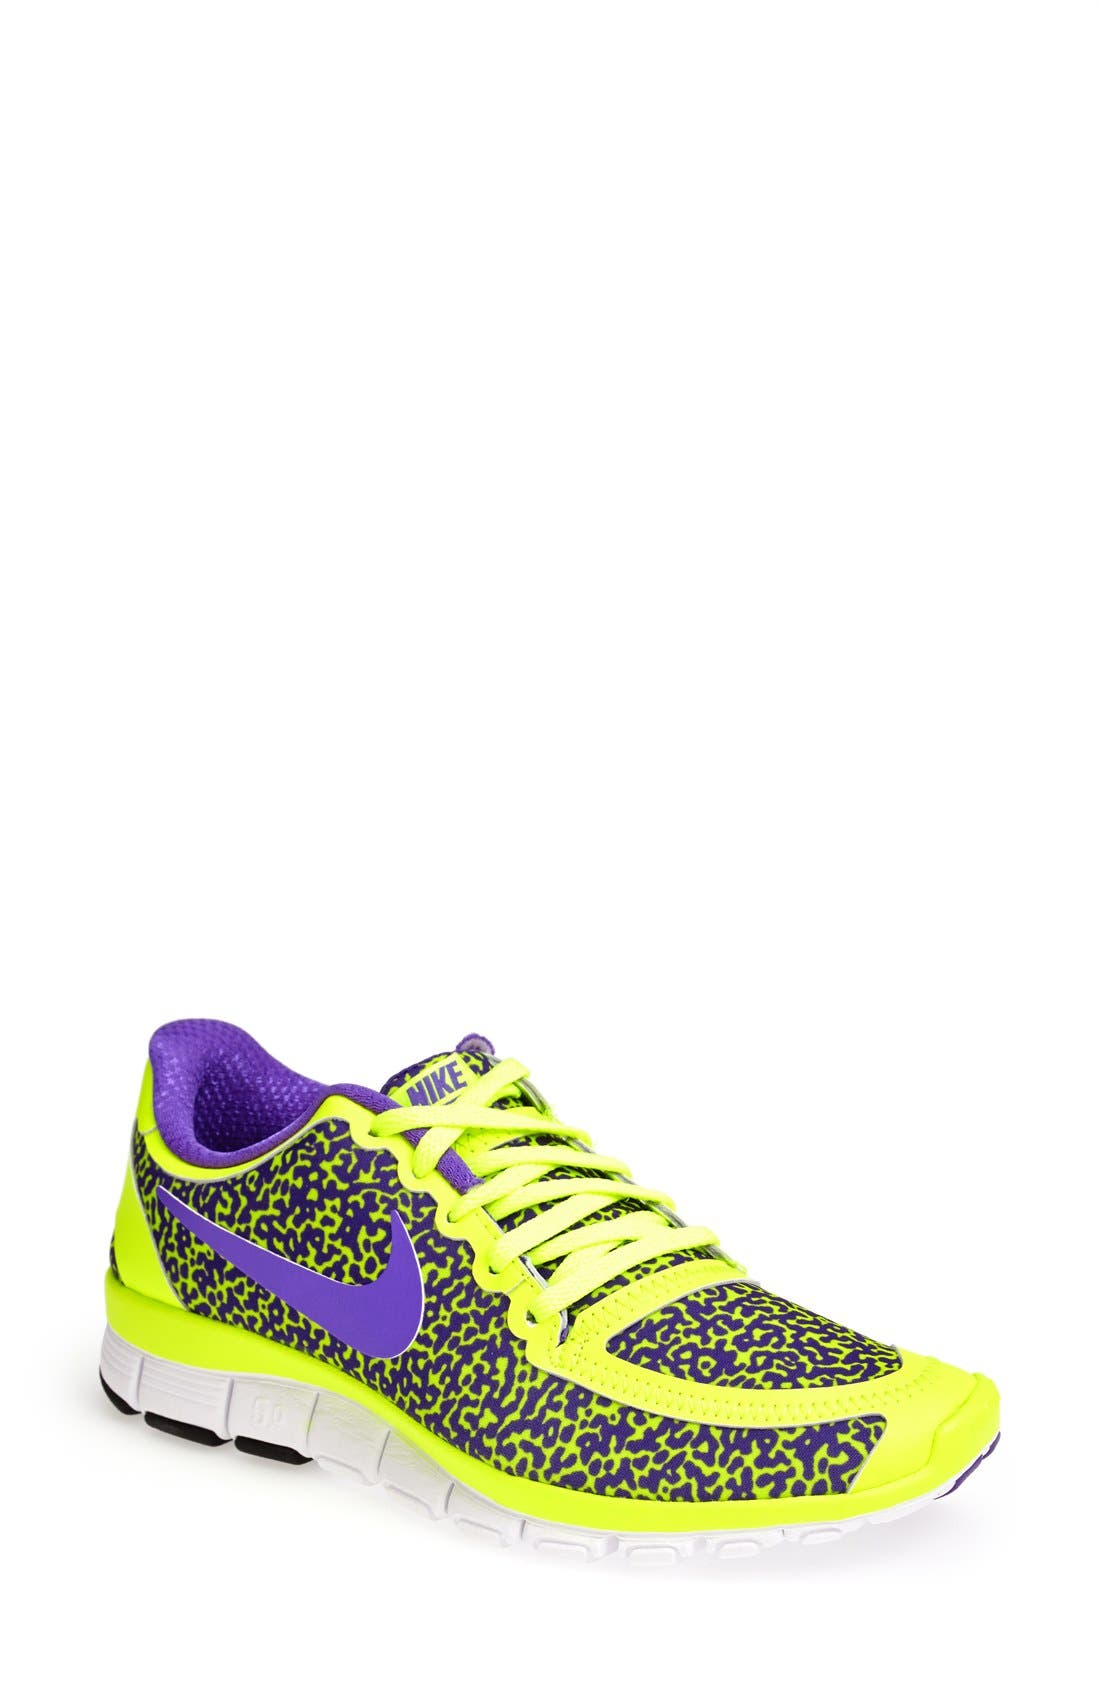 Main Image - Nike 'Free 5.0 V4' Running Shoe (Women)